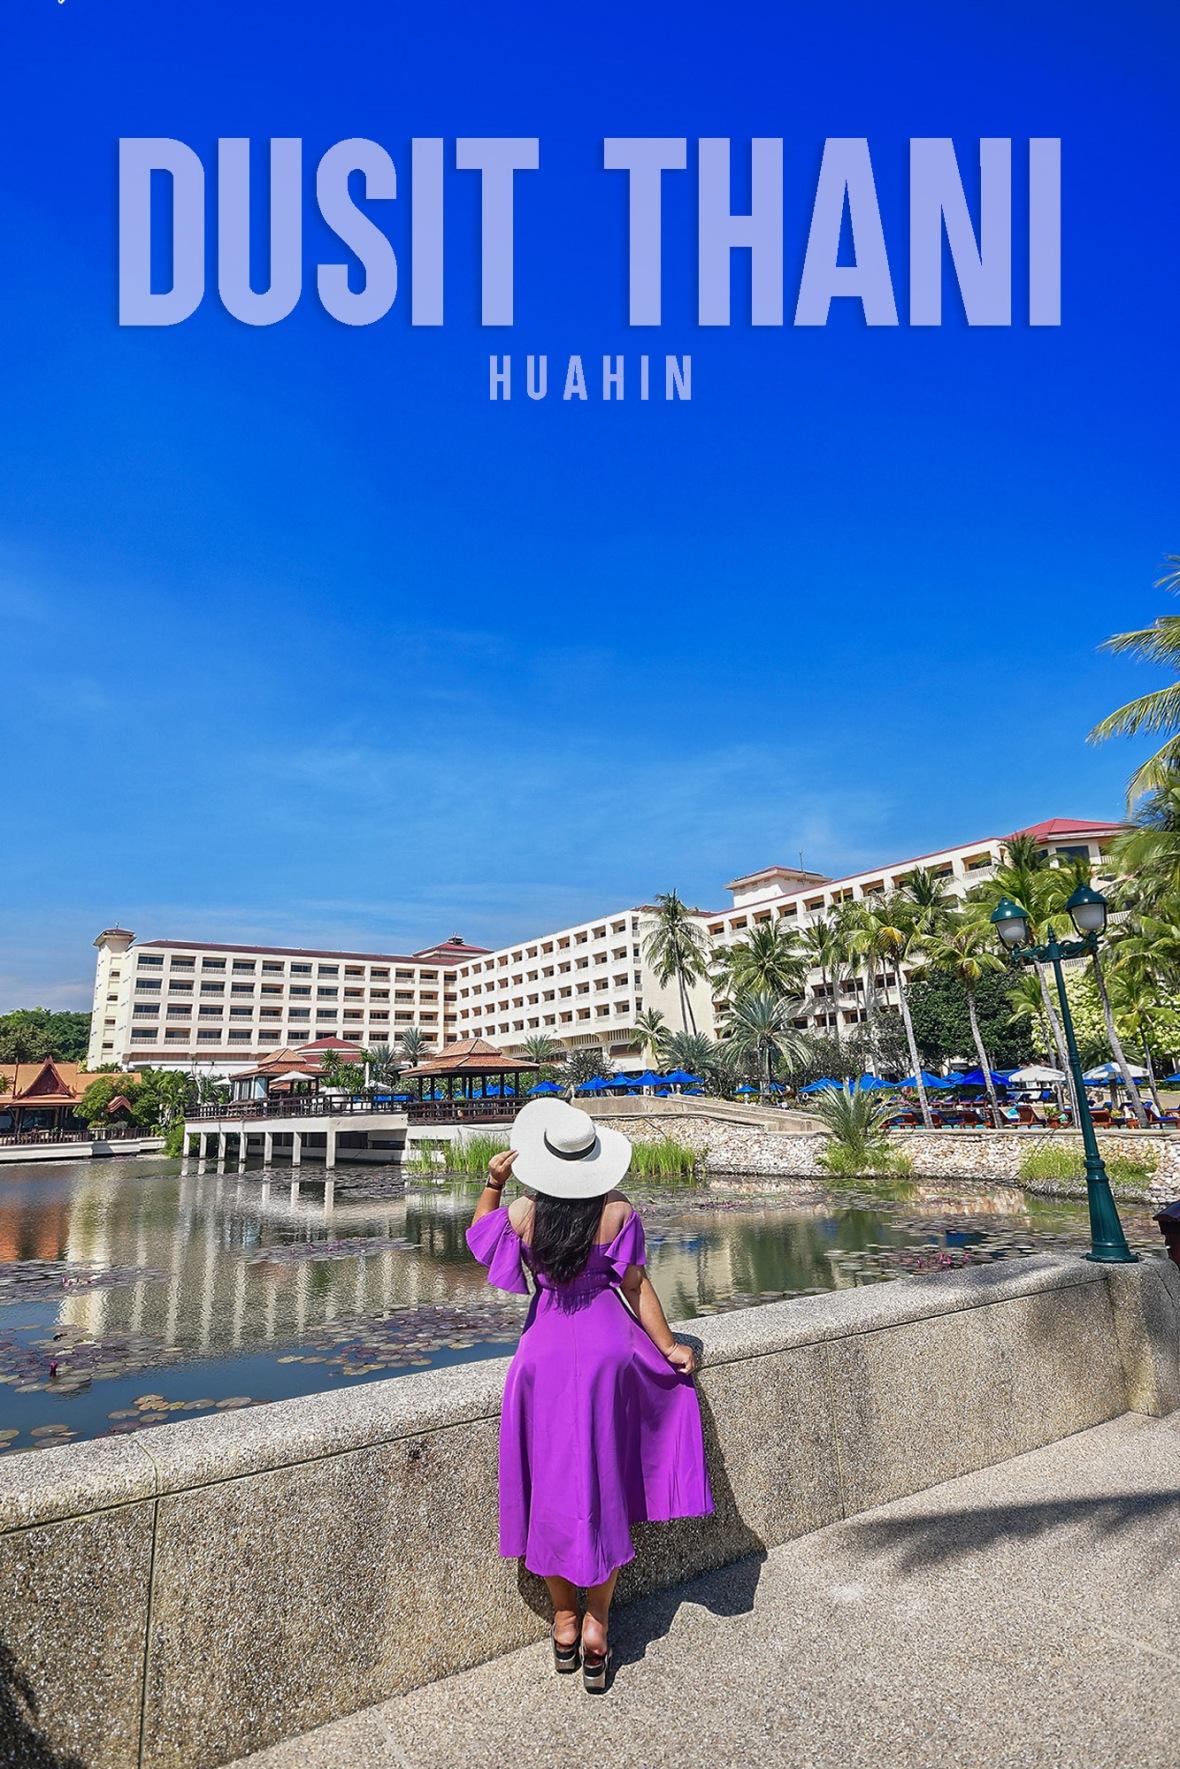 Dusit Thani Hua Hin Hotel (1)